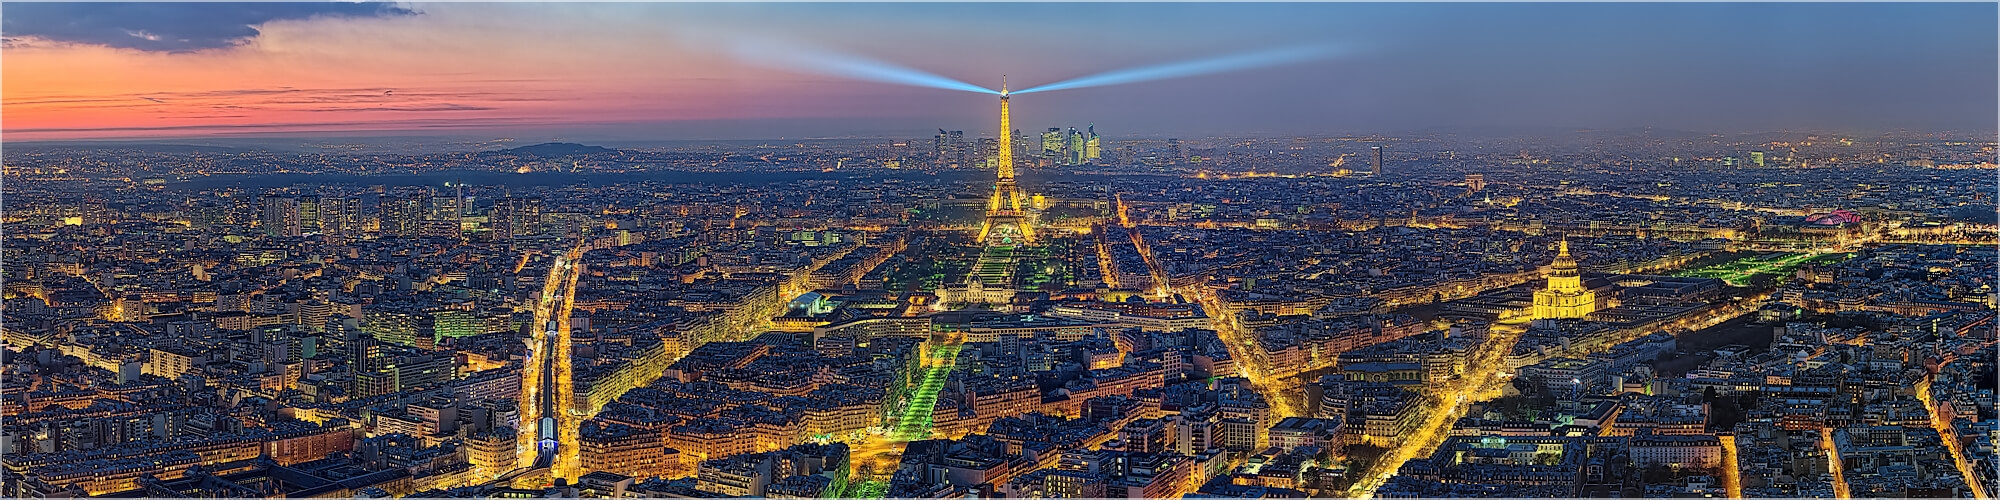 Panoramabild Skyline Paris mit Eifelturm